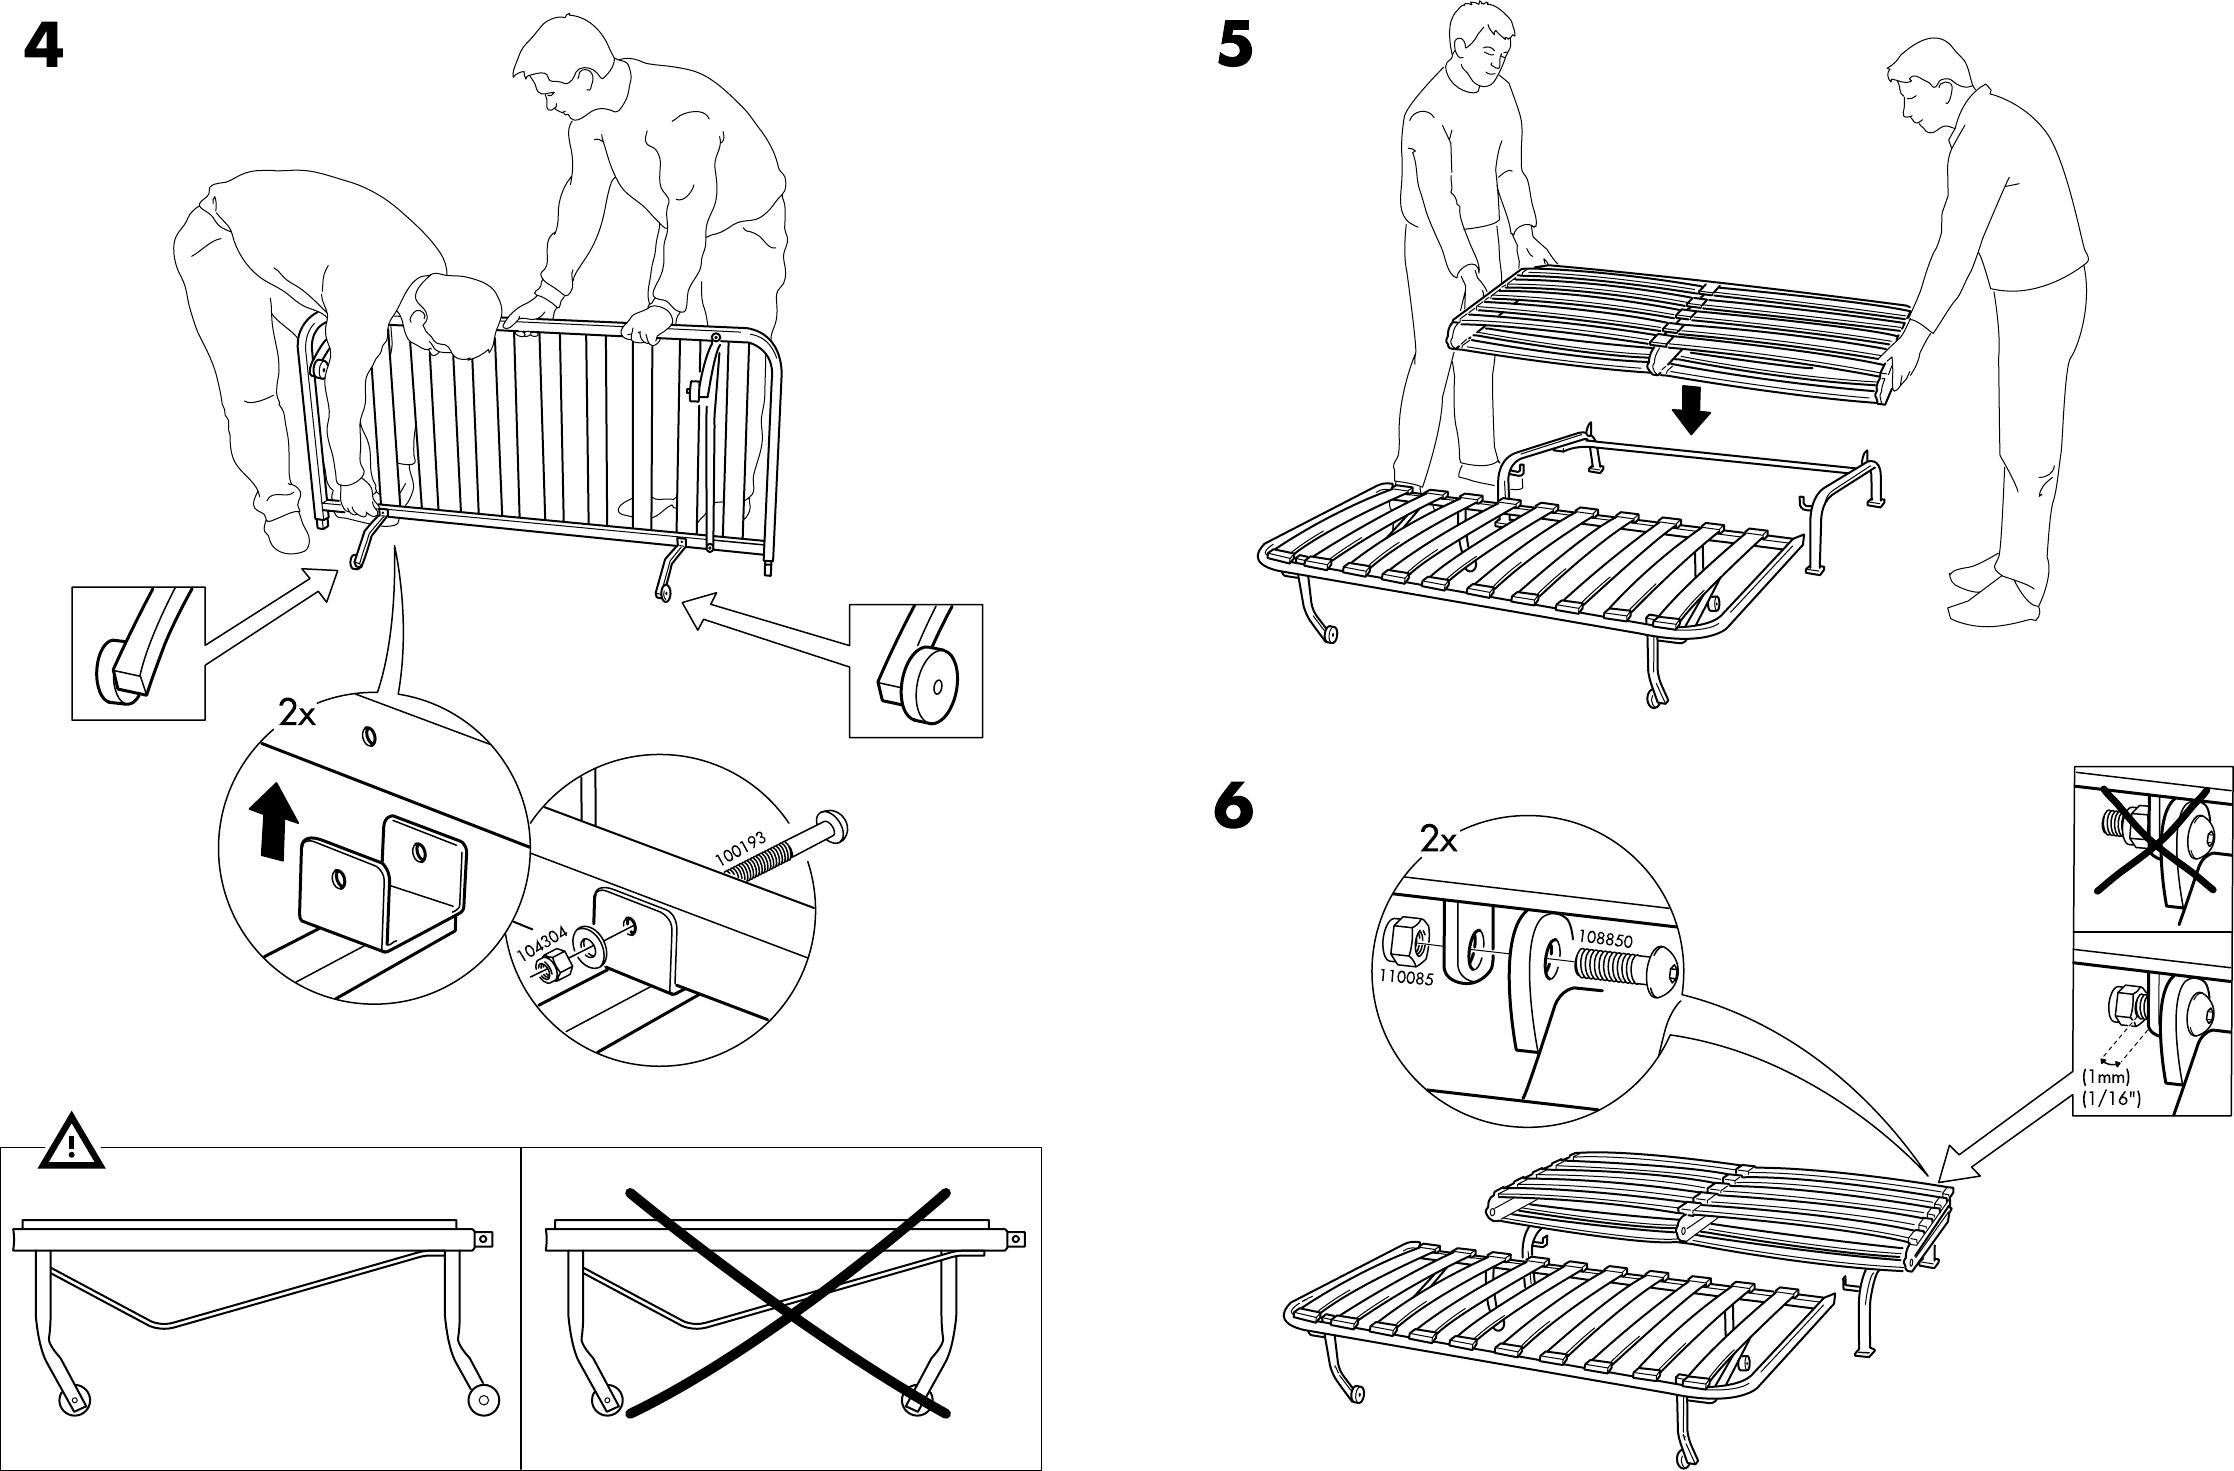 Lyksele Slaapbank Ikea.Handleiding Ikea Lycksele Onderstel Slaapbank Pagina 6 Van 6